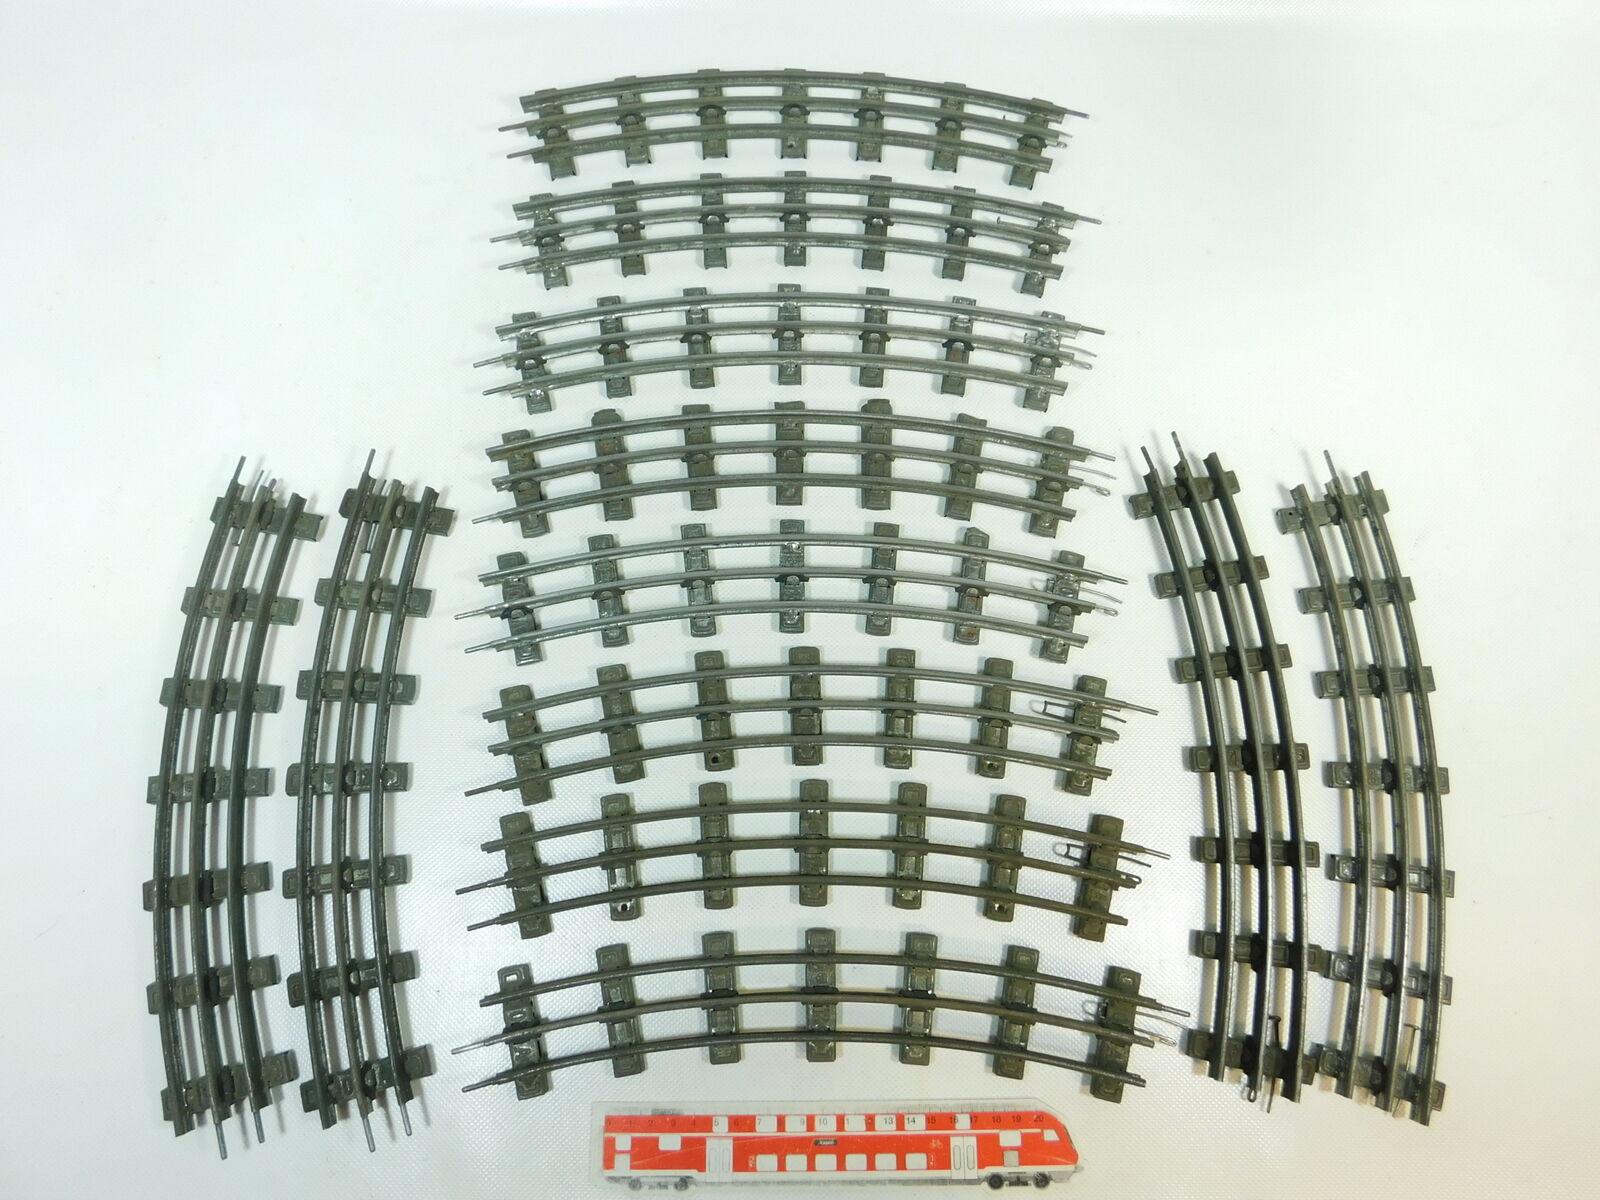 BR645-2x Märklin Progress Spur 0 Gleis gebogen 12er Kreis für elektr Betrieb